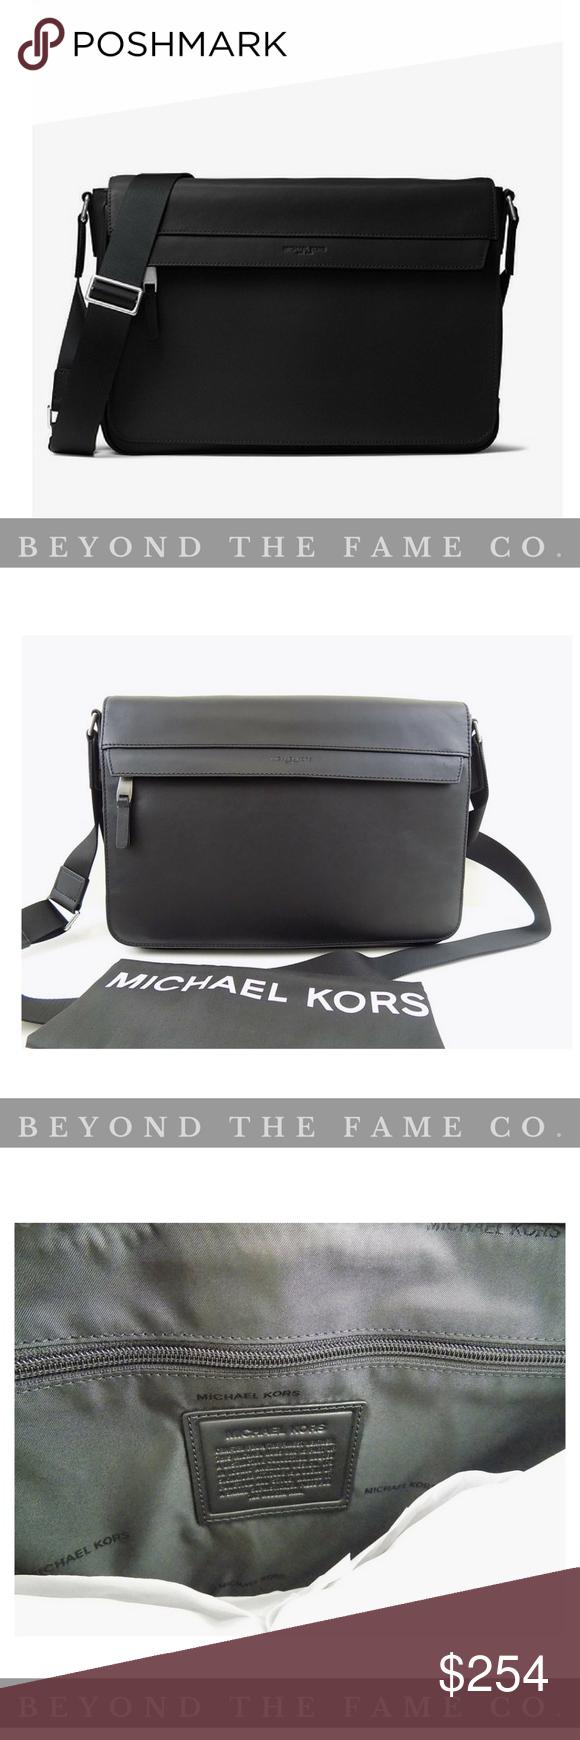 112ad62771c0 Michael Kors Men s Odin Resina Large Messenger Bag AUTHENTIC Michael Kors  ITEM IS NEW IN original